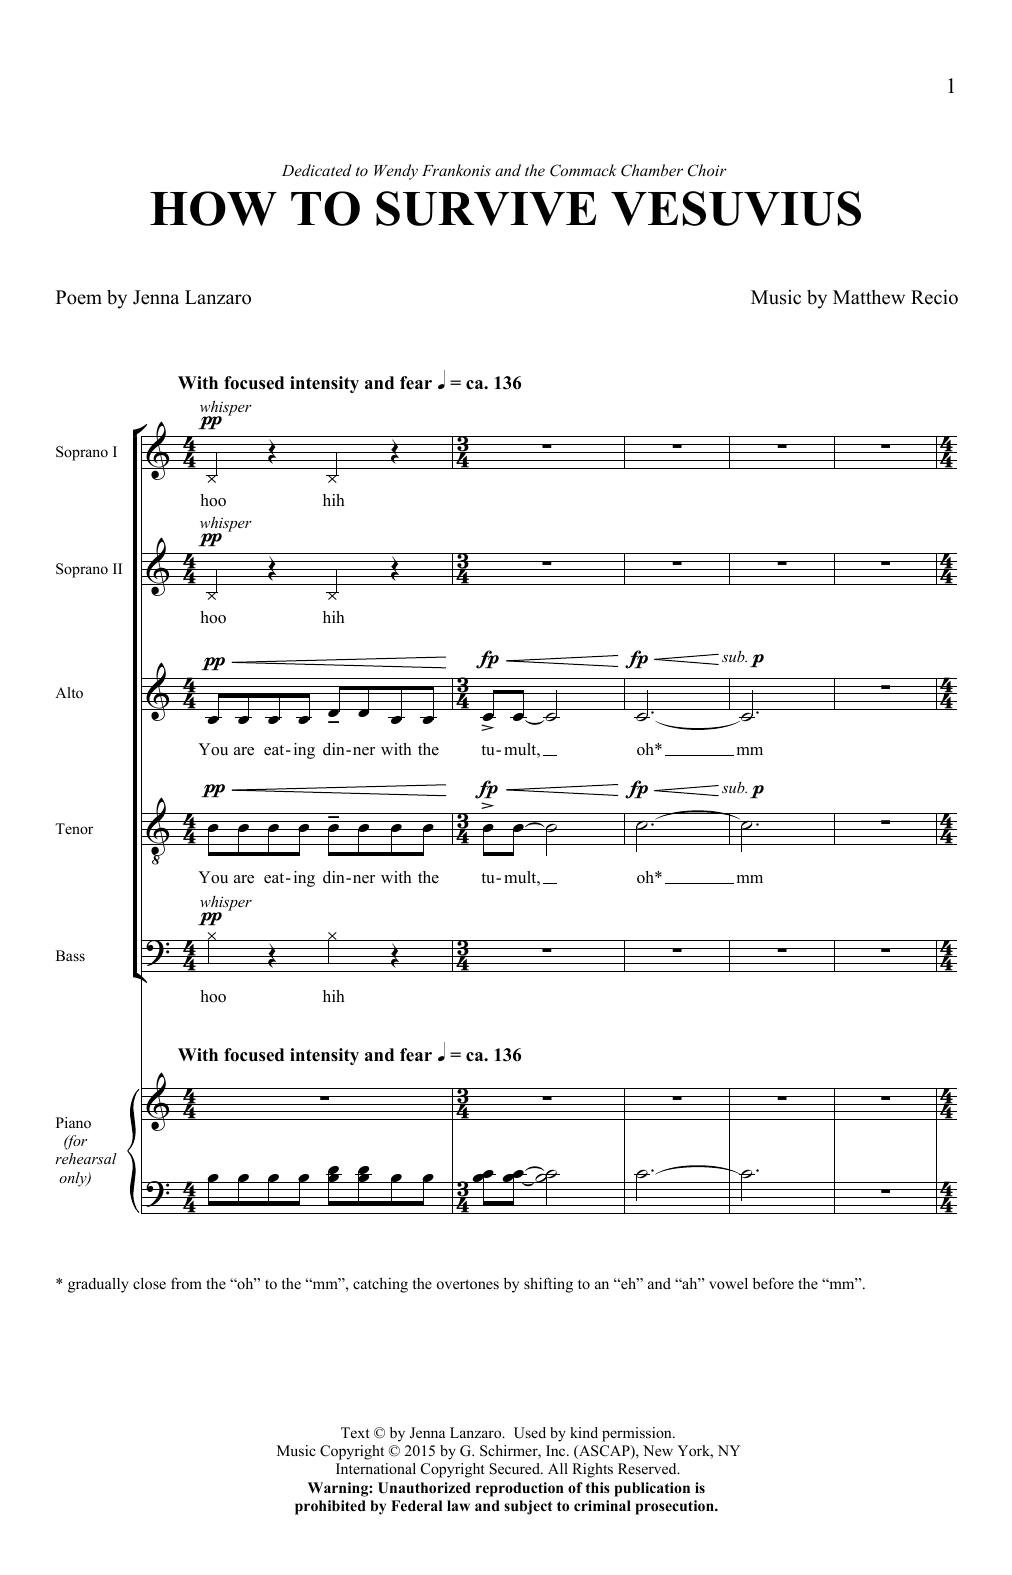 How To Survive Vesuvius (SATB Choir)